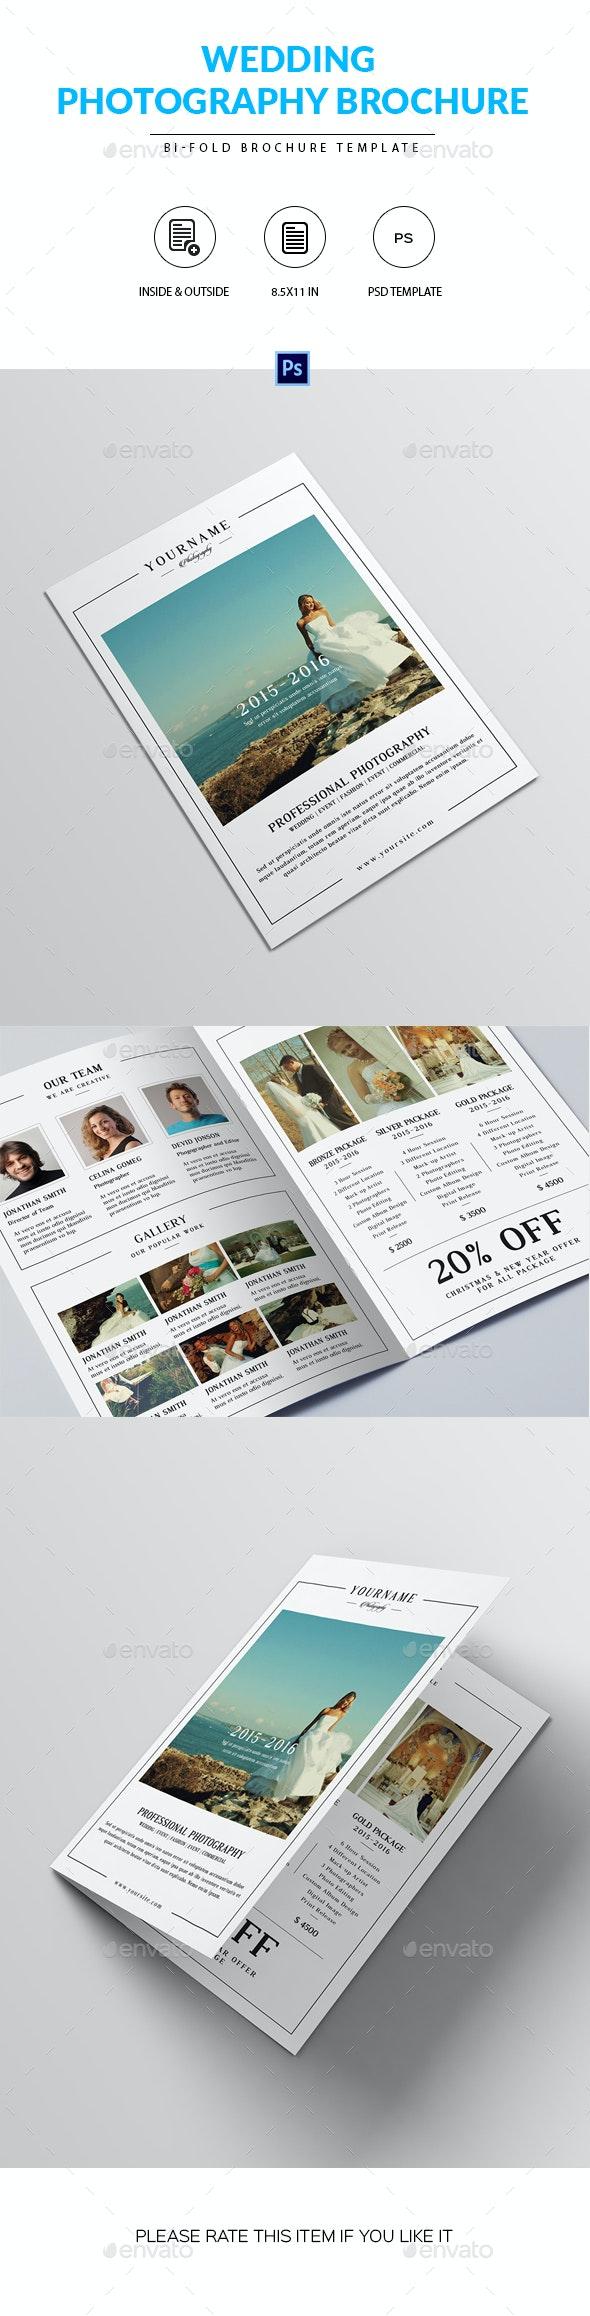 Wedding Photography Brochure Template - Corporate Brochures